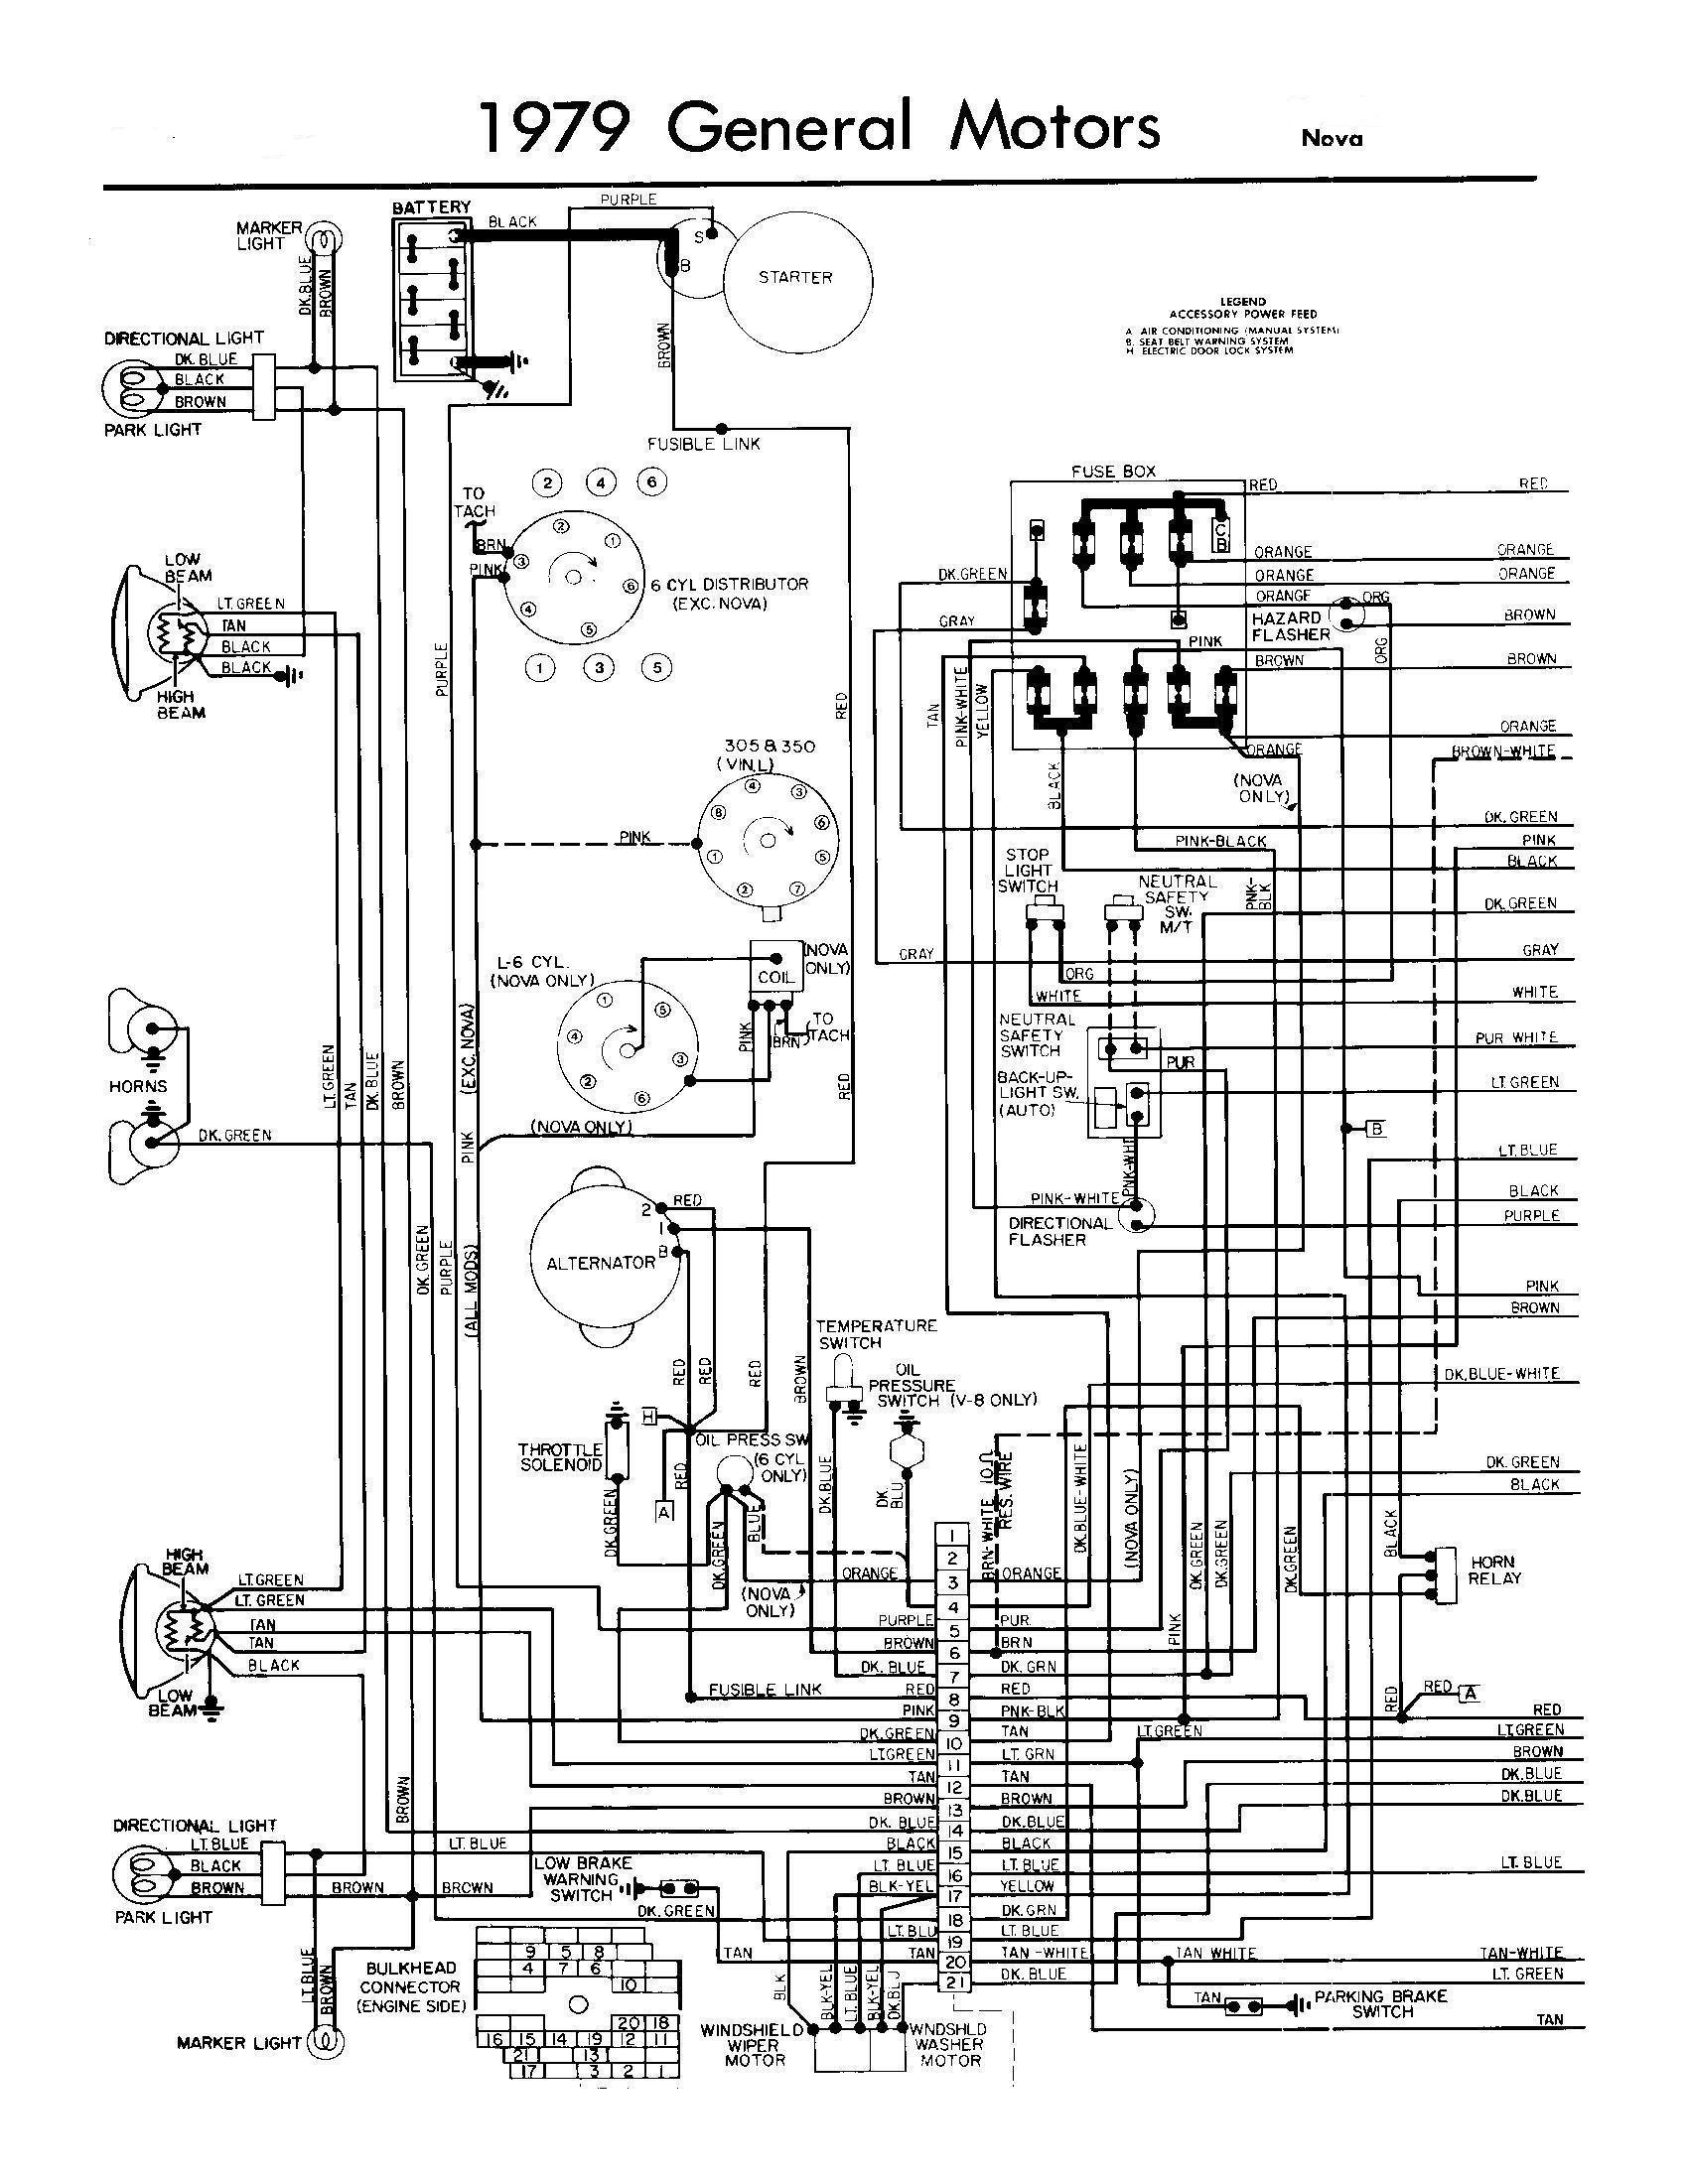 Wiring Diagram for Car Alternator Awesome 3 Wire Alternator Wiring